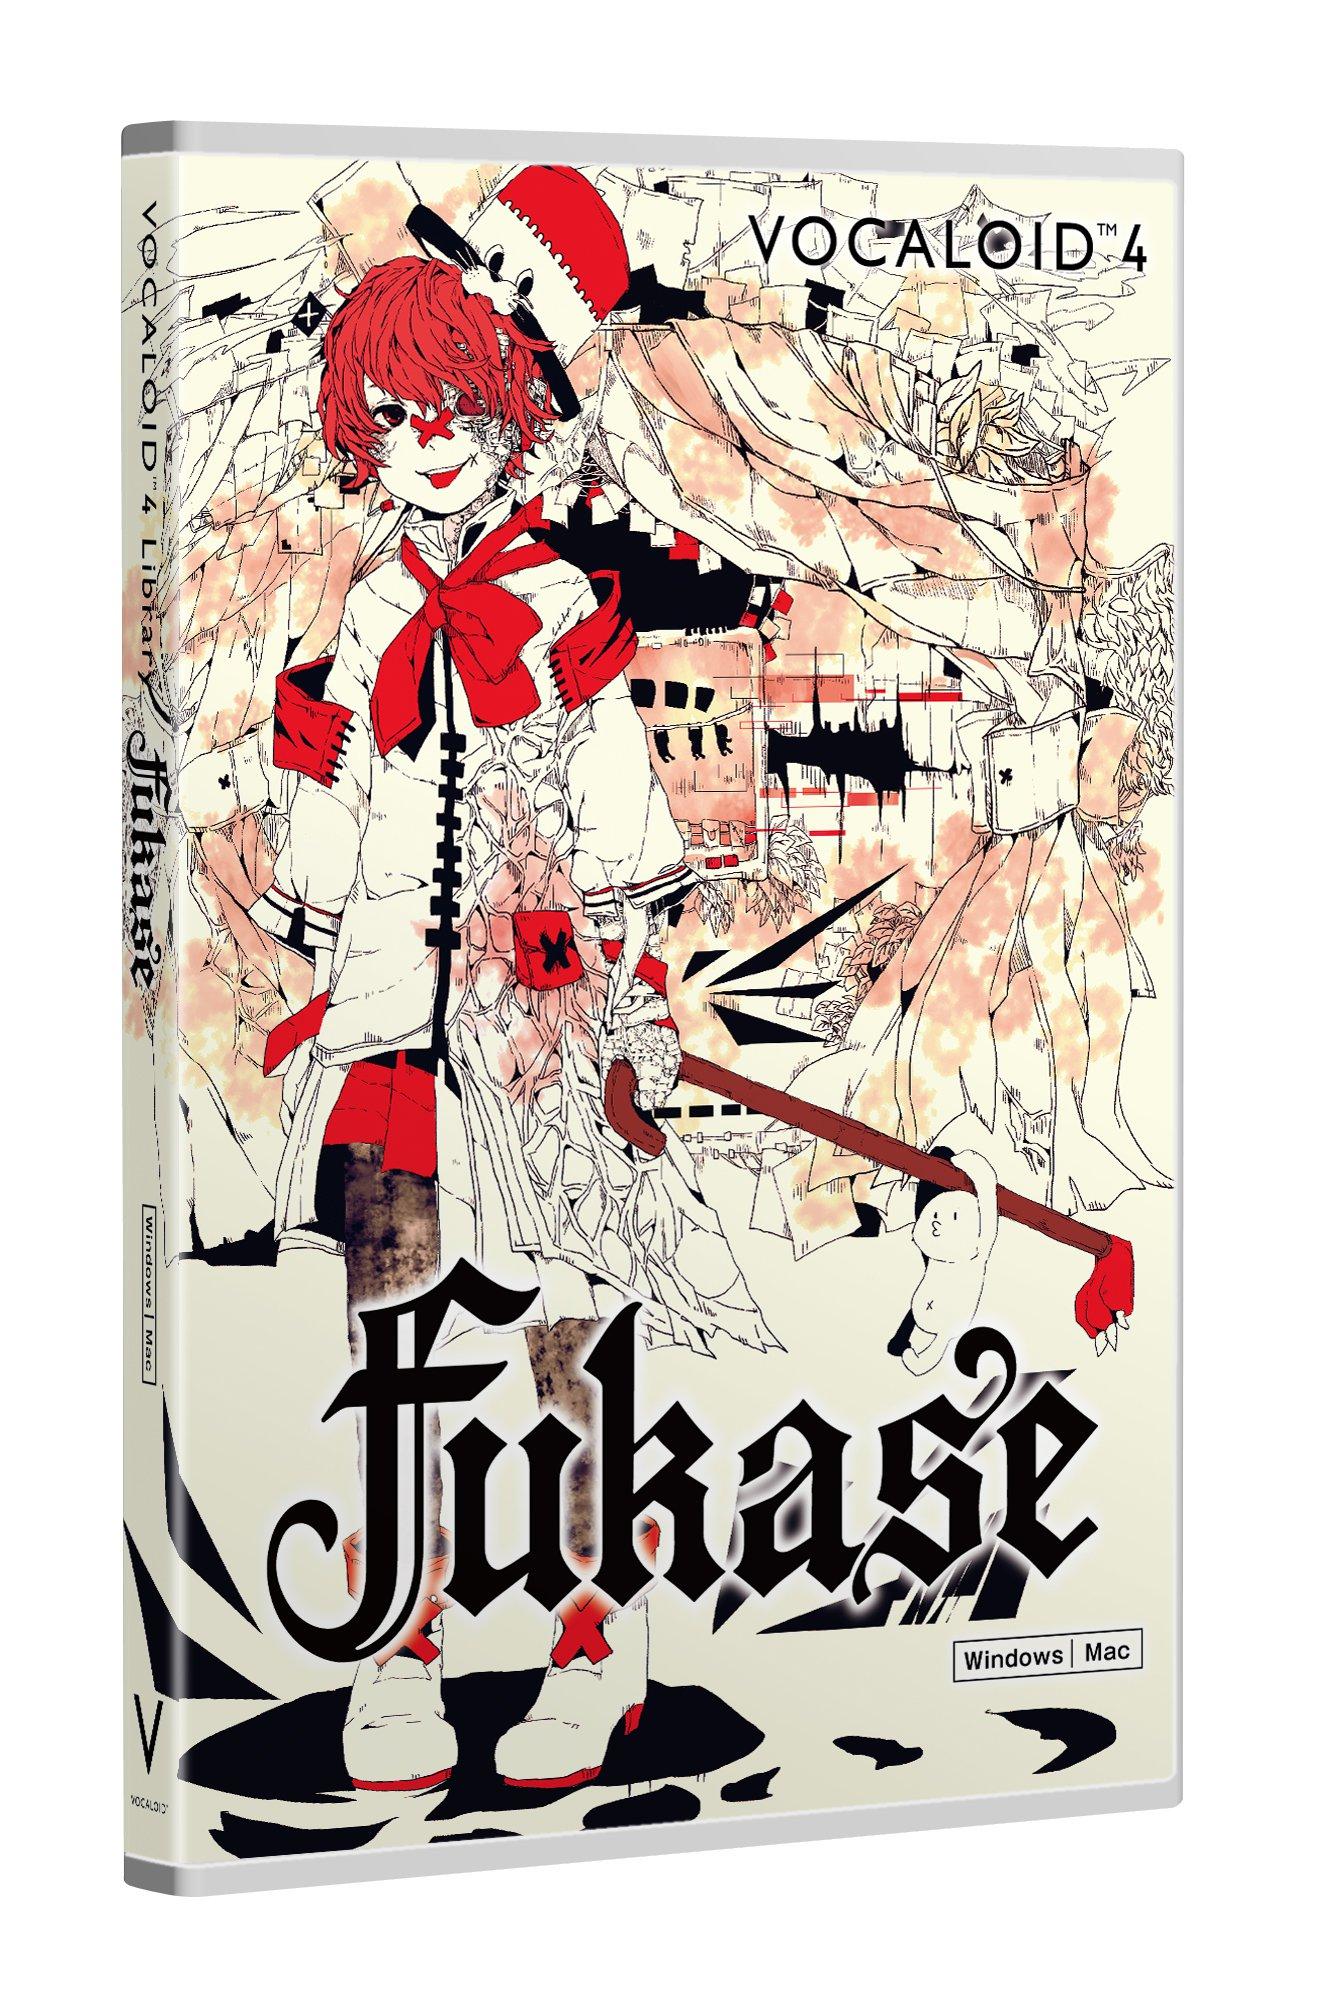 VOCALOID Fukase Box Art